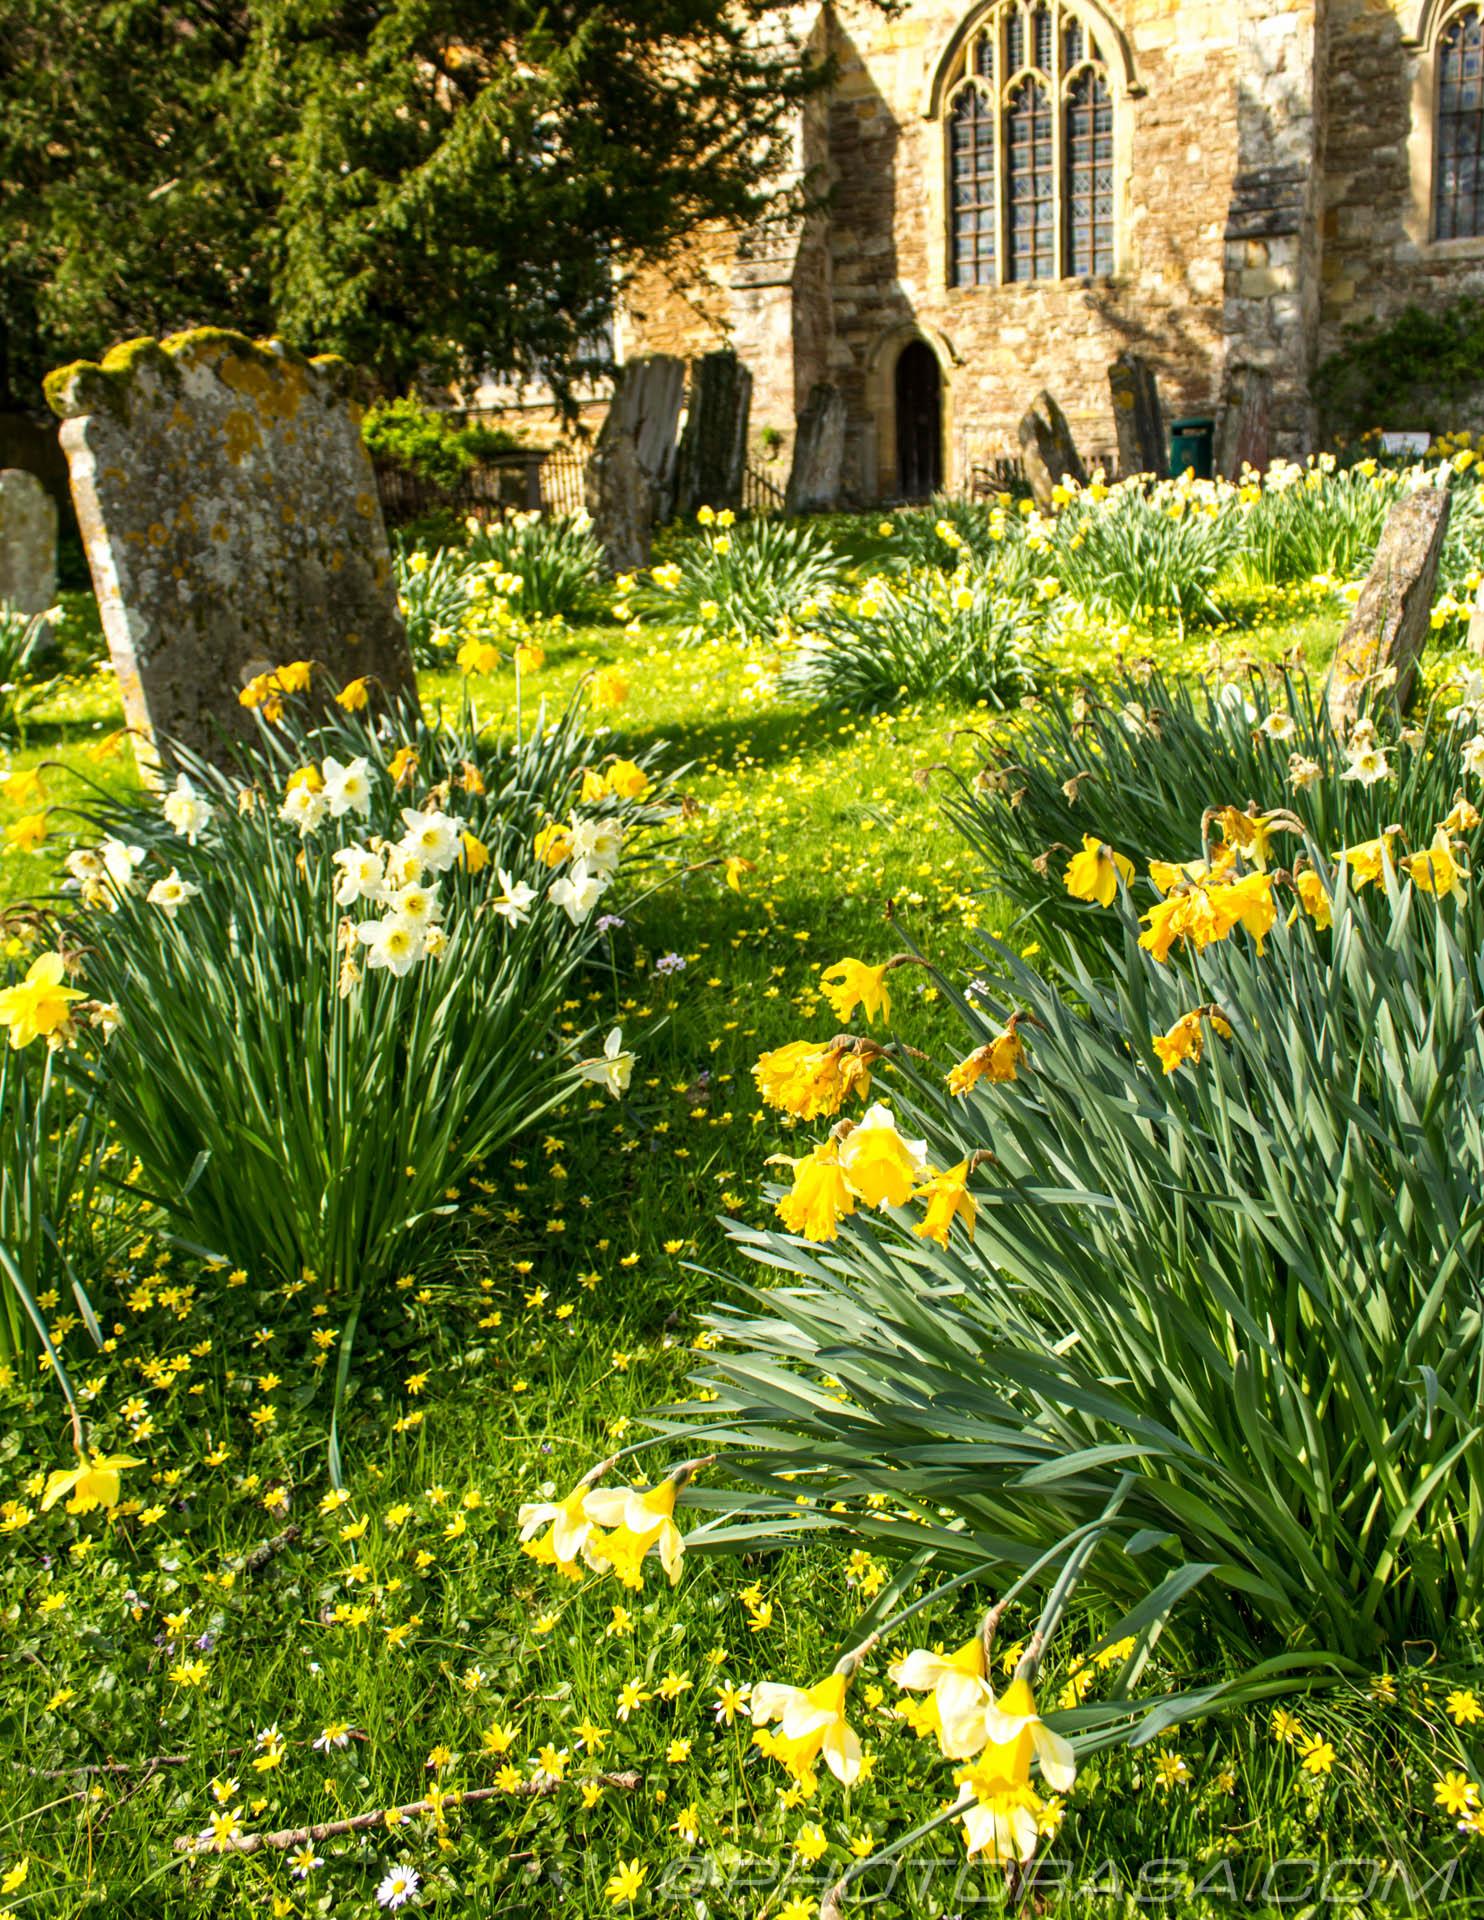 https://photorasa.com/saints-church-staplehurst-kent/daffs-and-buttercups-leading-to-church-door/